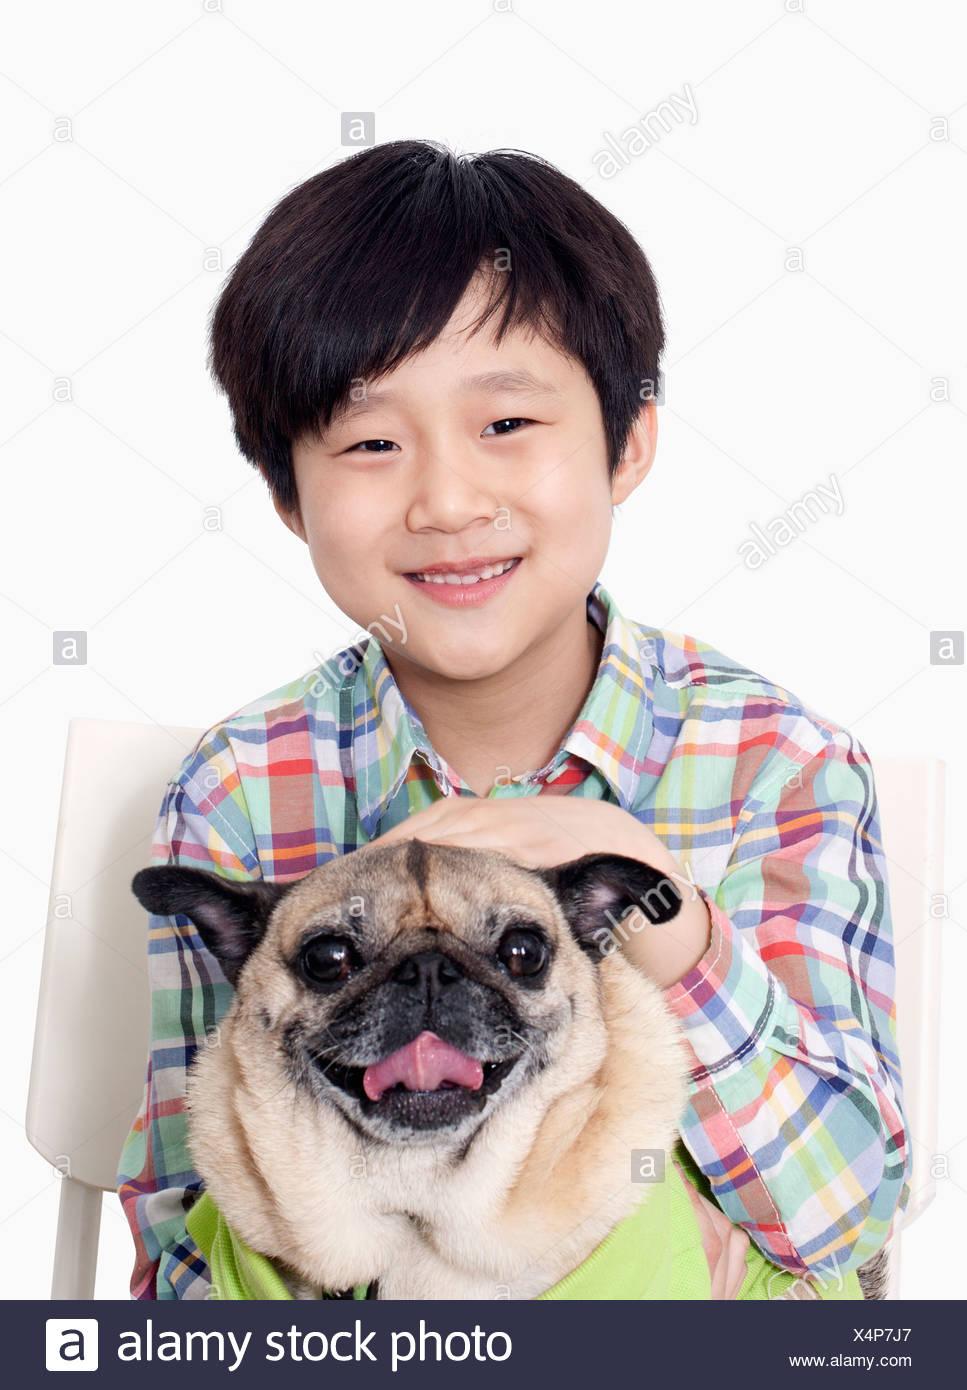 Portrait of Boy holding pet pug - Stock Image